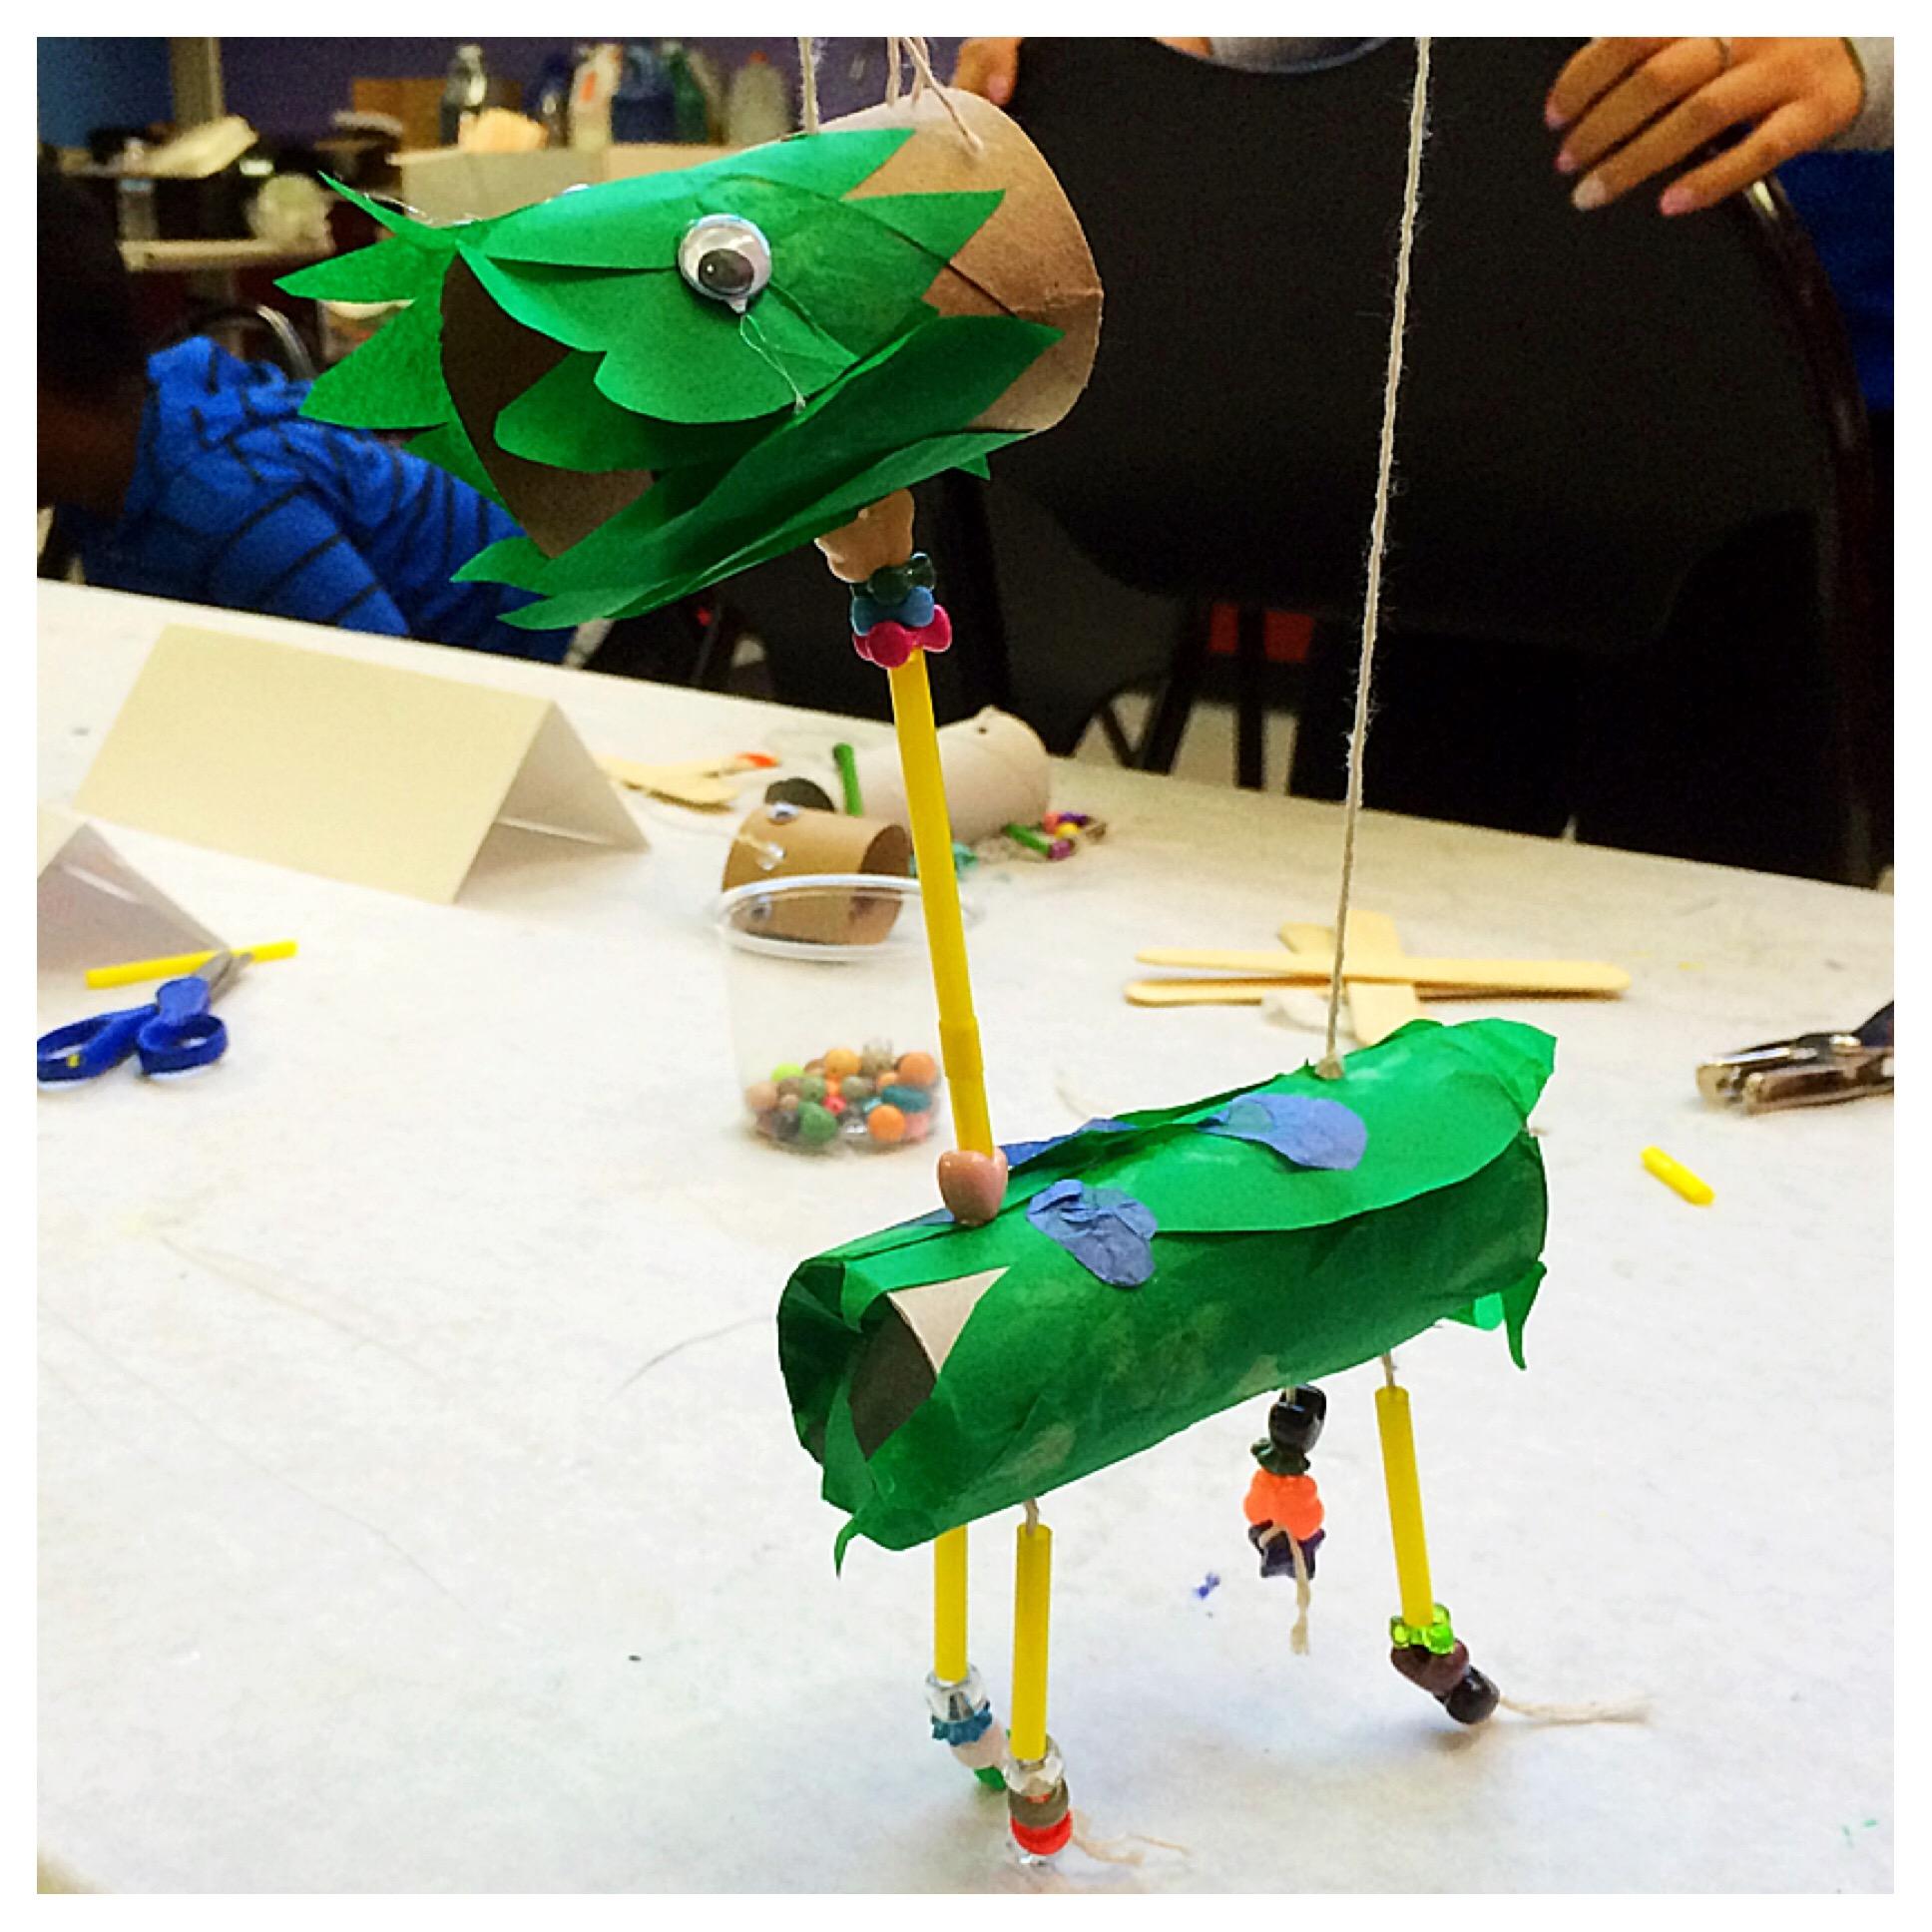 Cardboard tube bird marionette!